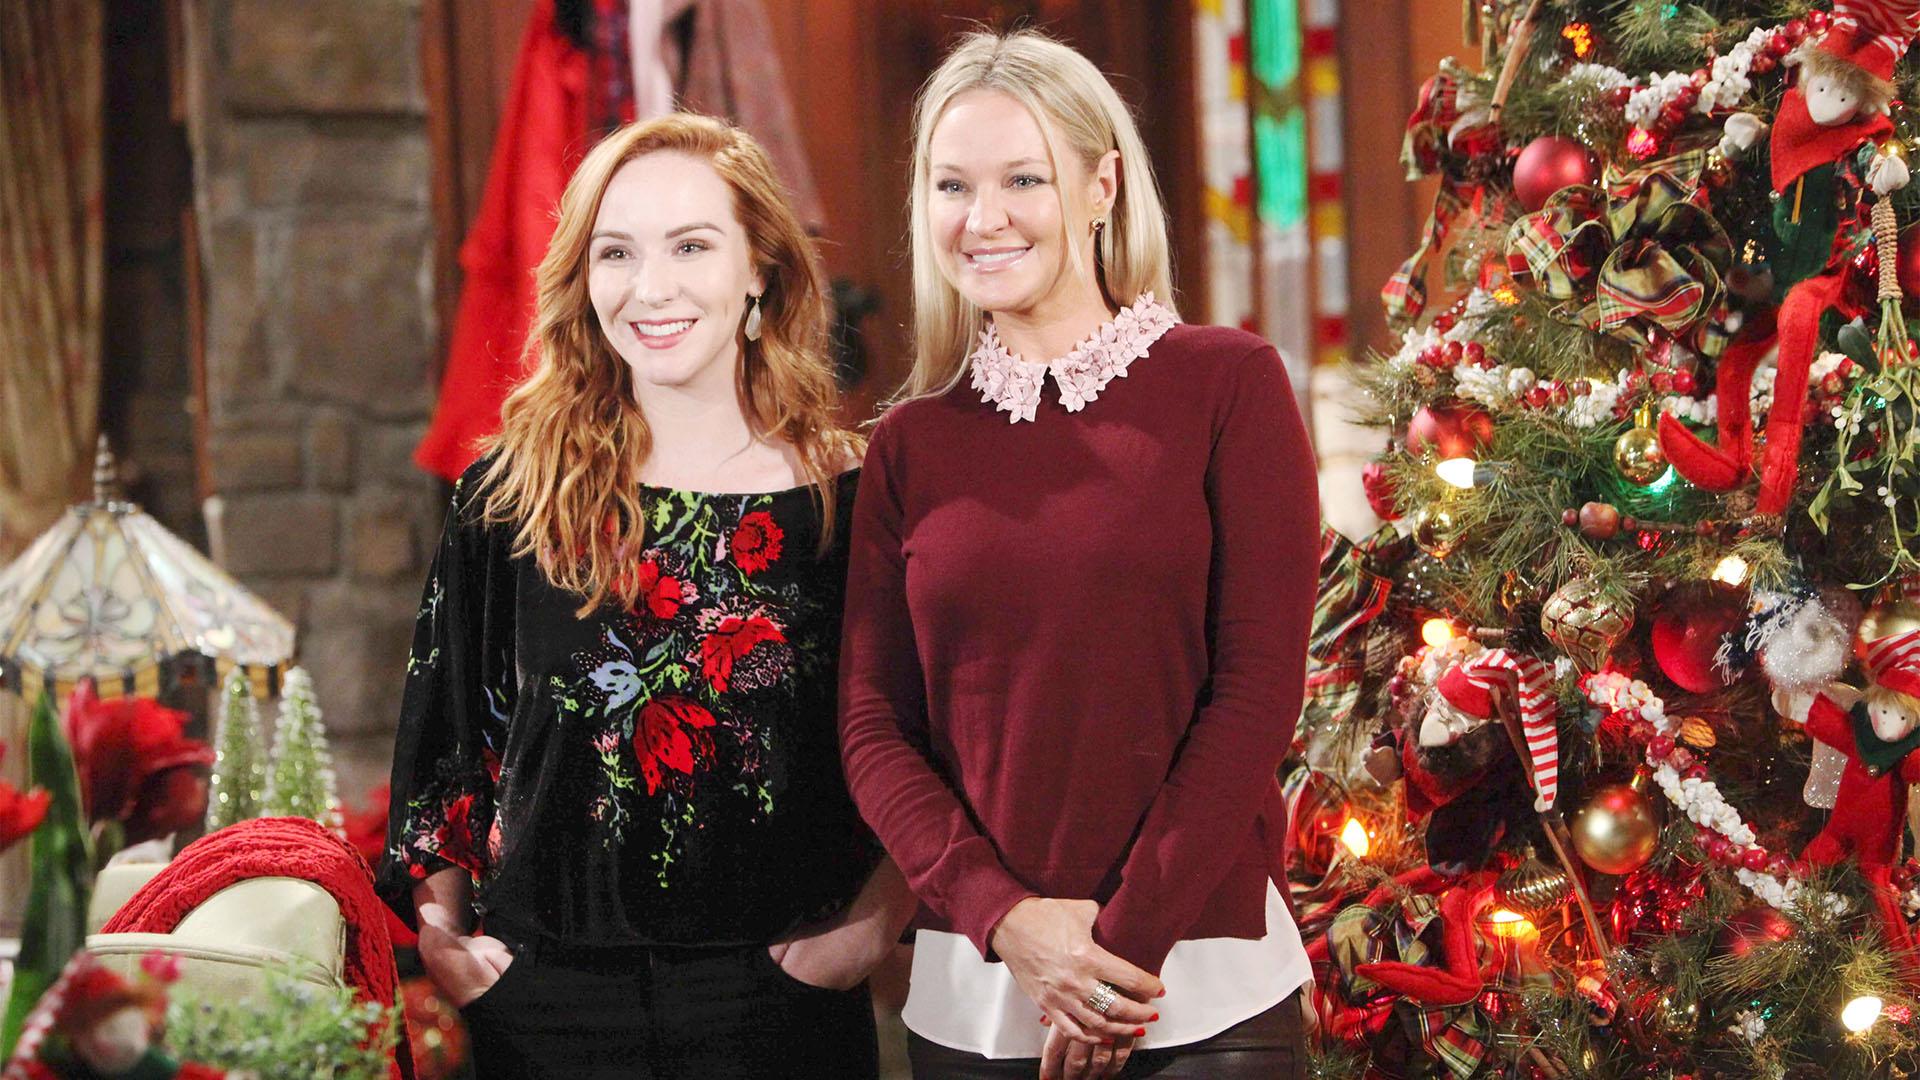 Mariah and Sharon create Christmas memories.